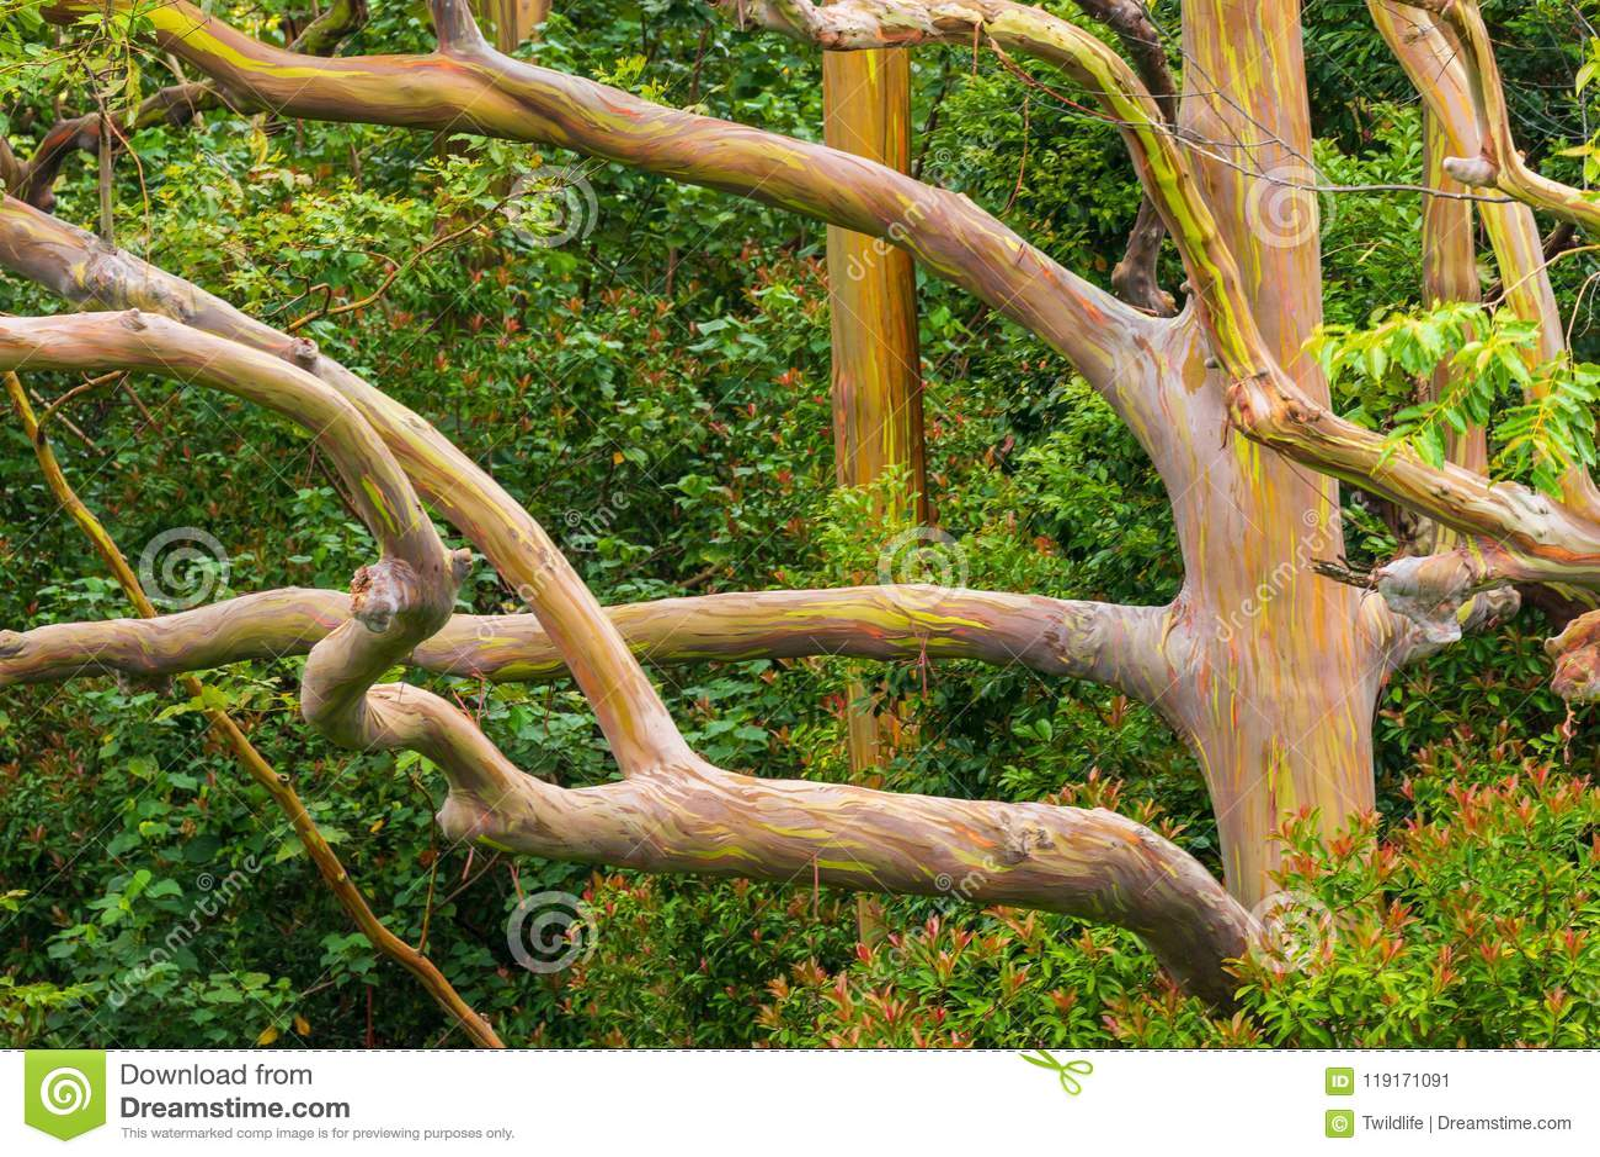 colorful rainbow eucalyptus tree on maui stock image image of